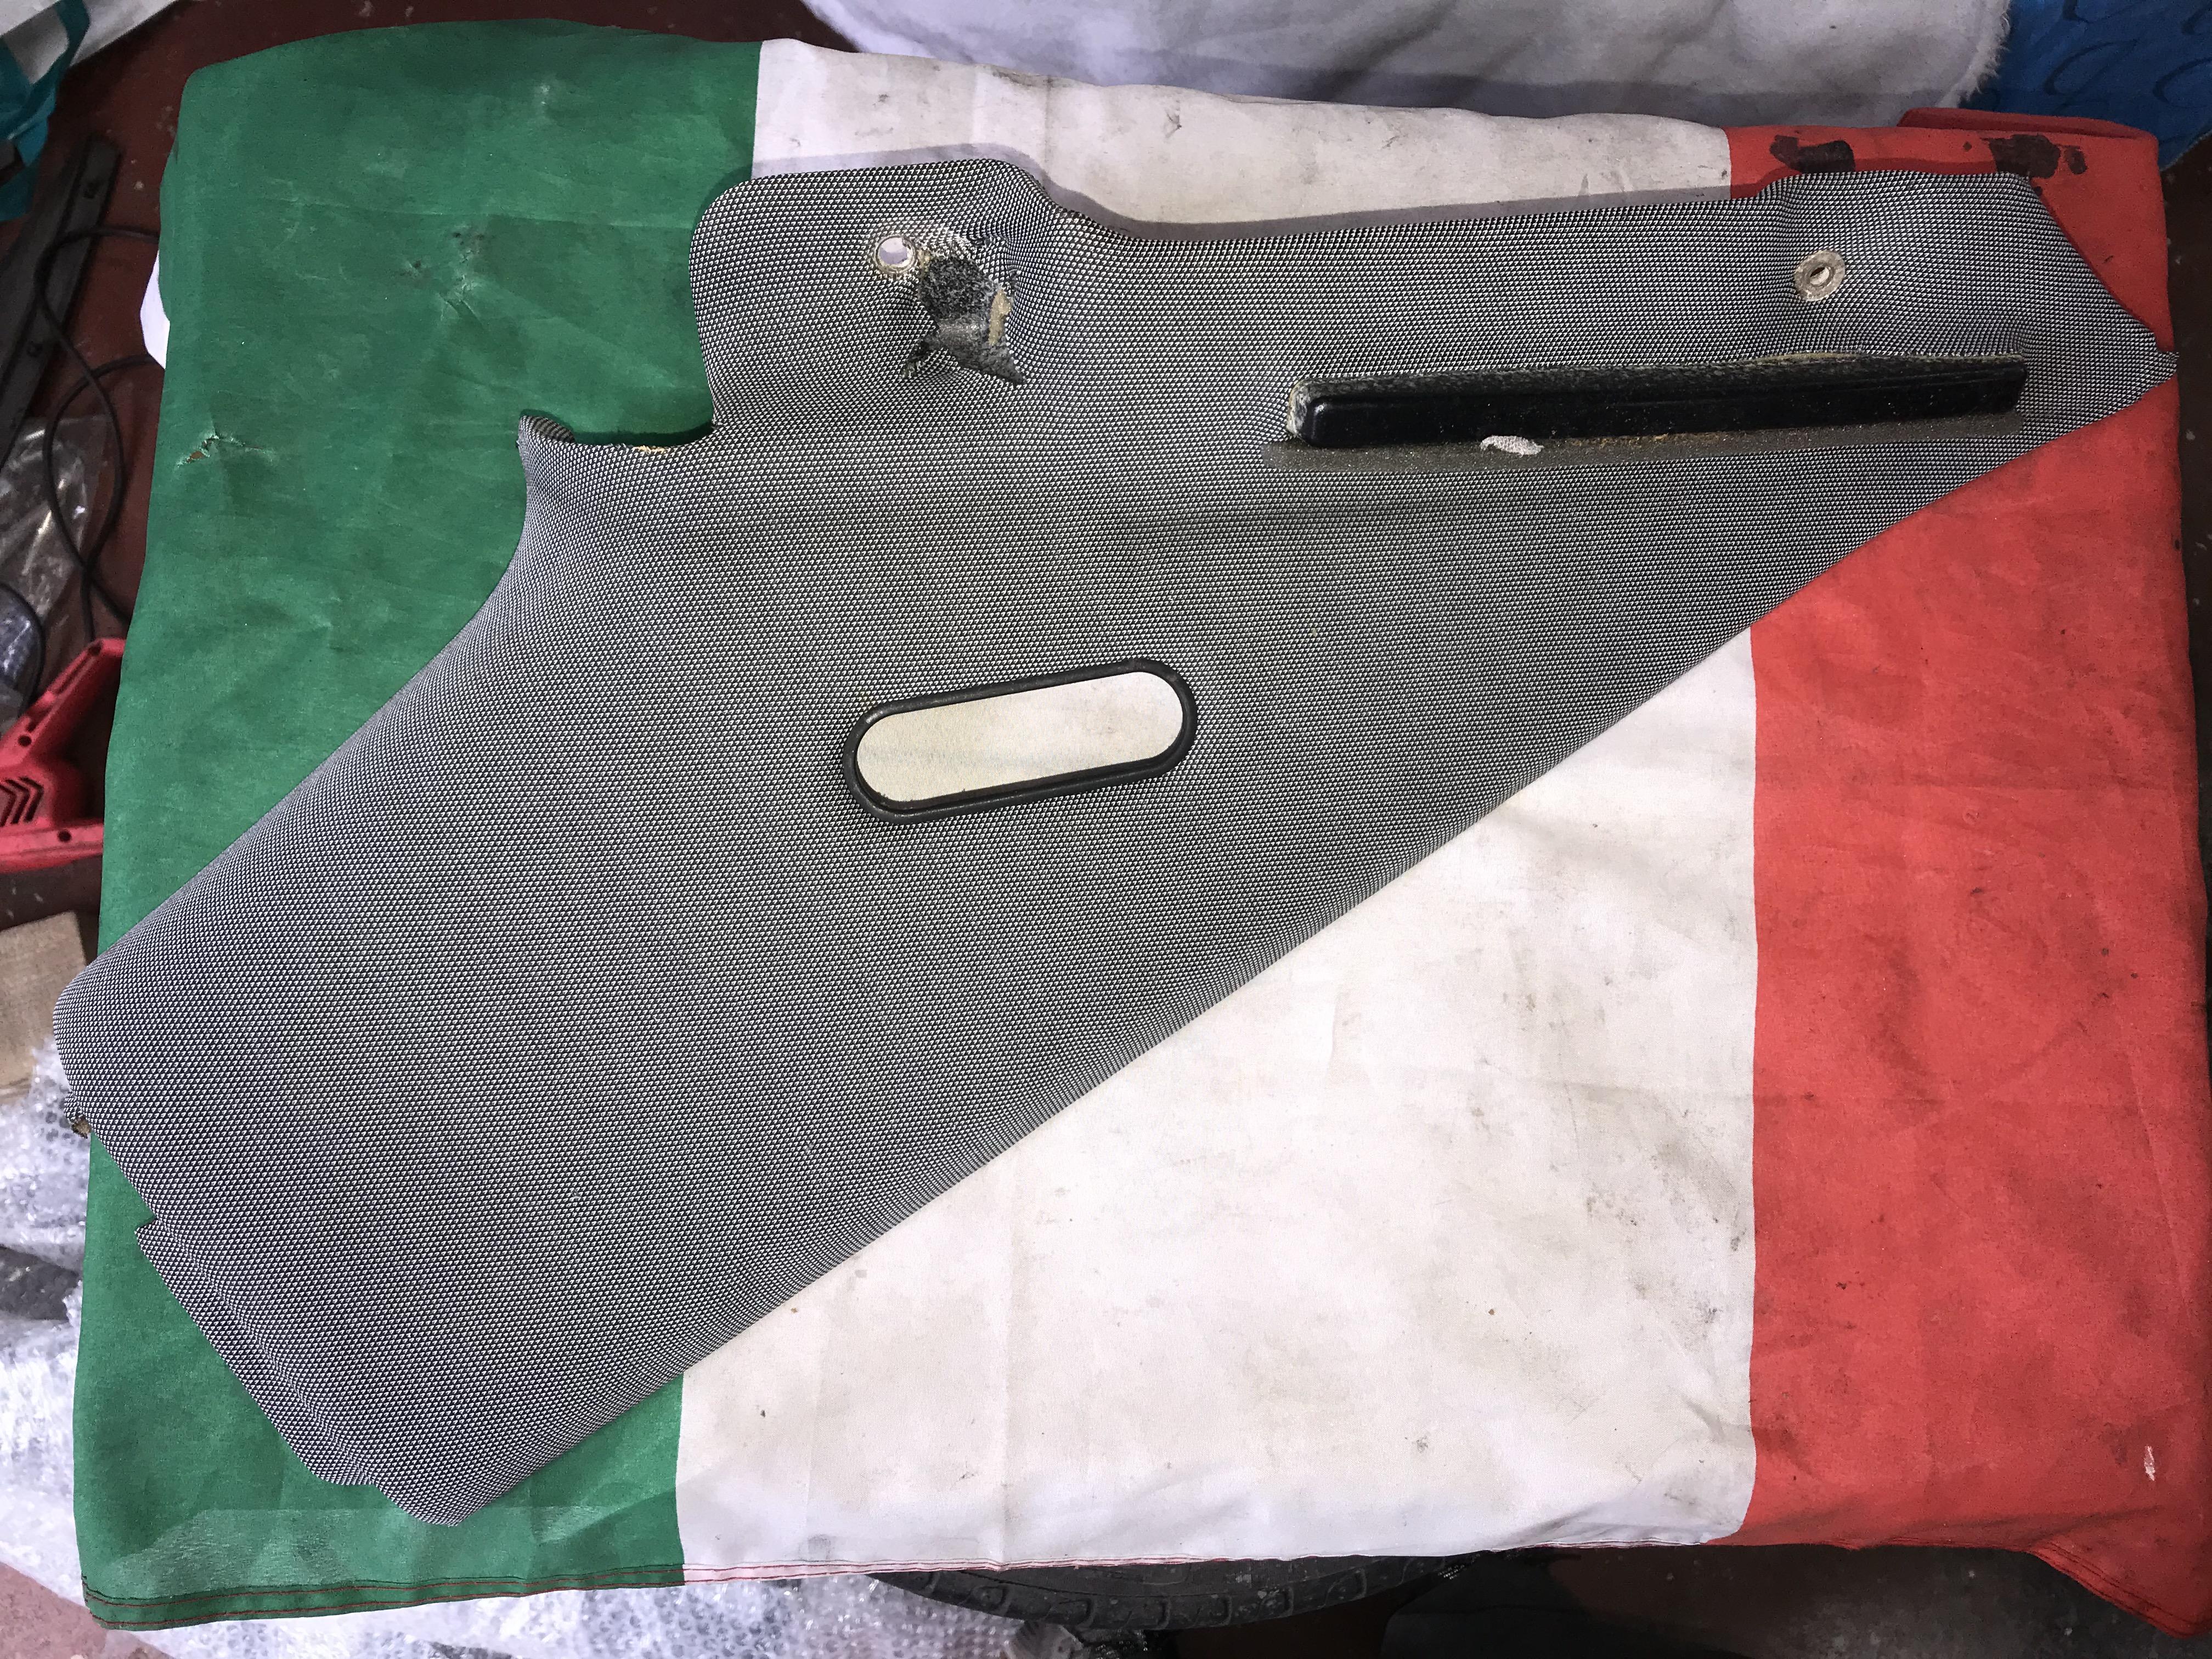 Alfa Romeo GTV 916 Limited Edition Cup C-pillar Cover Panel, Left Sx C-post